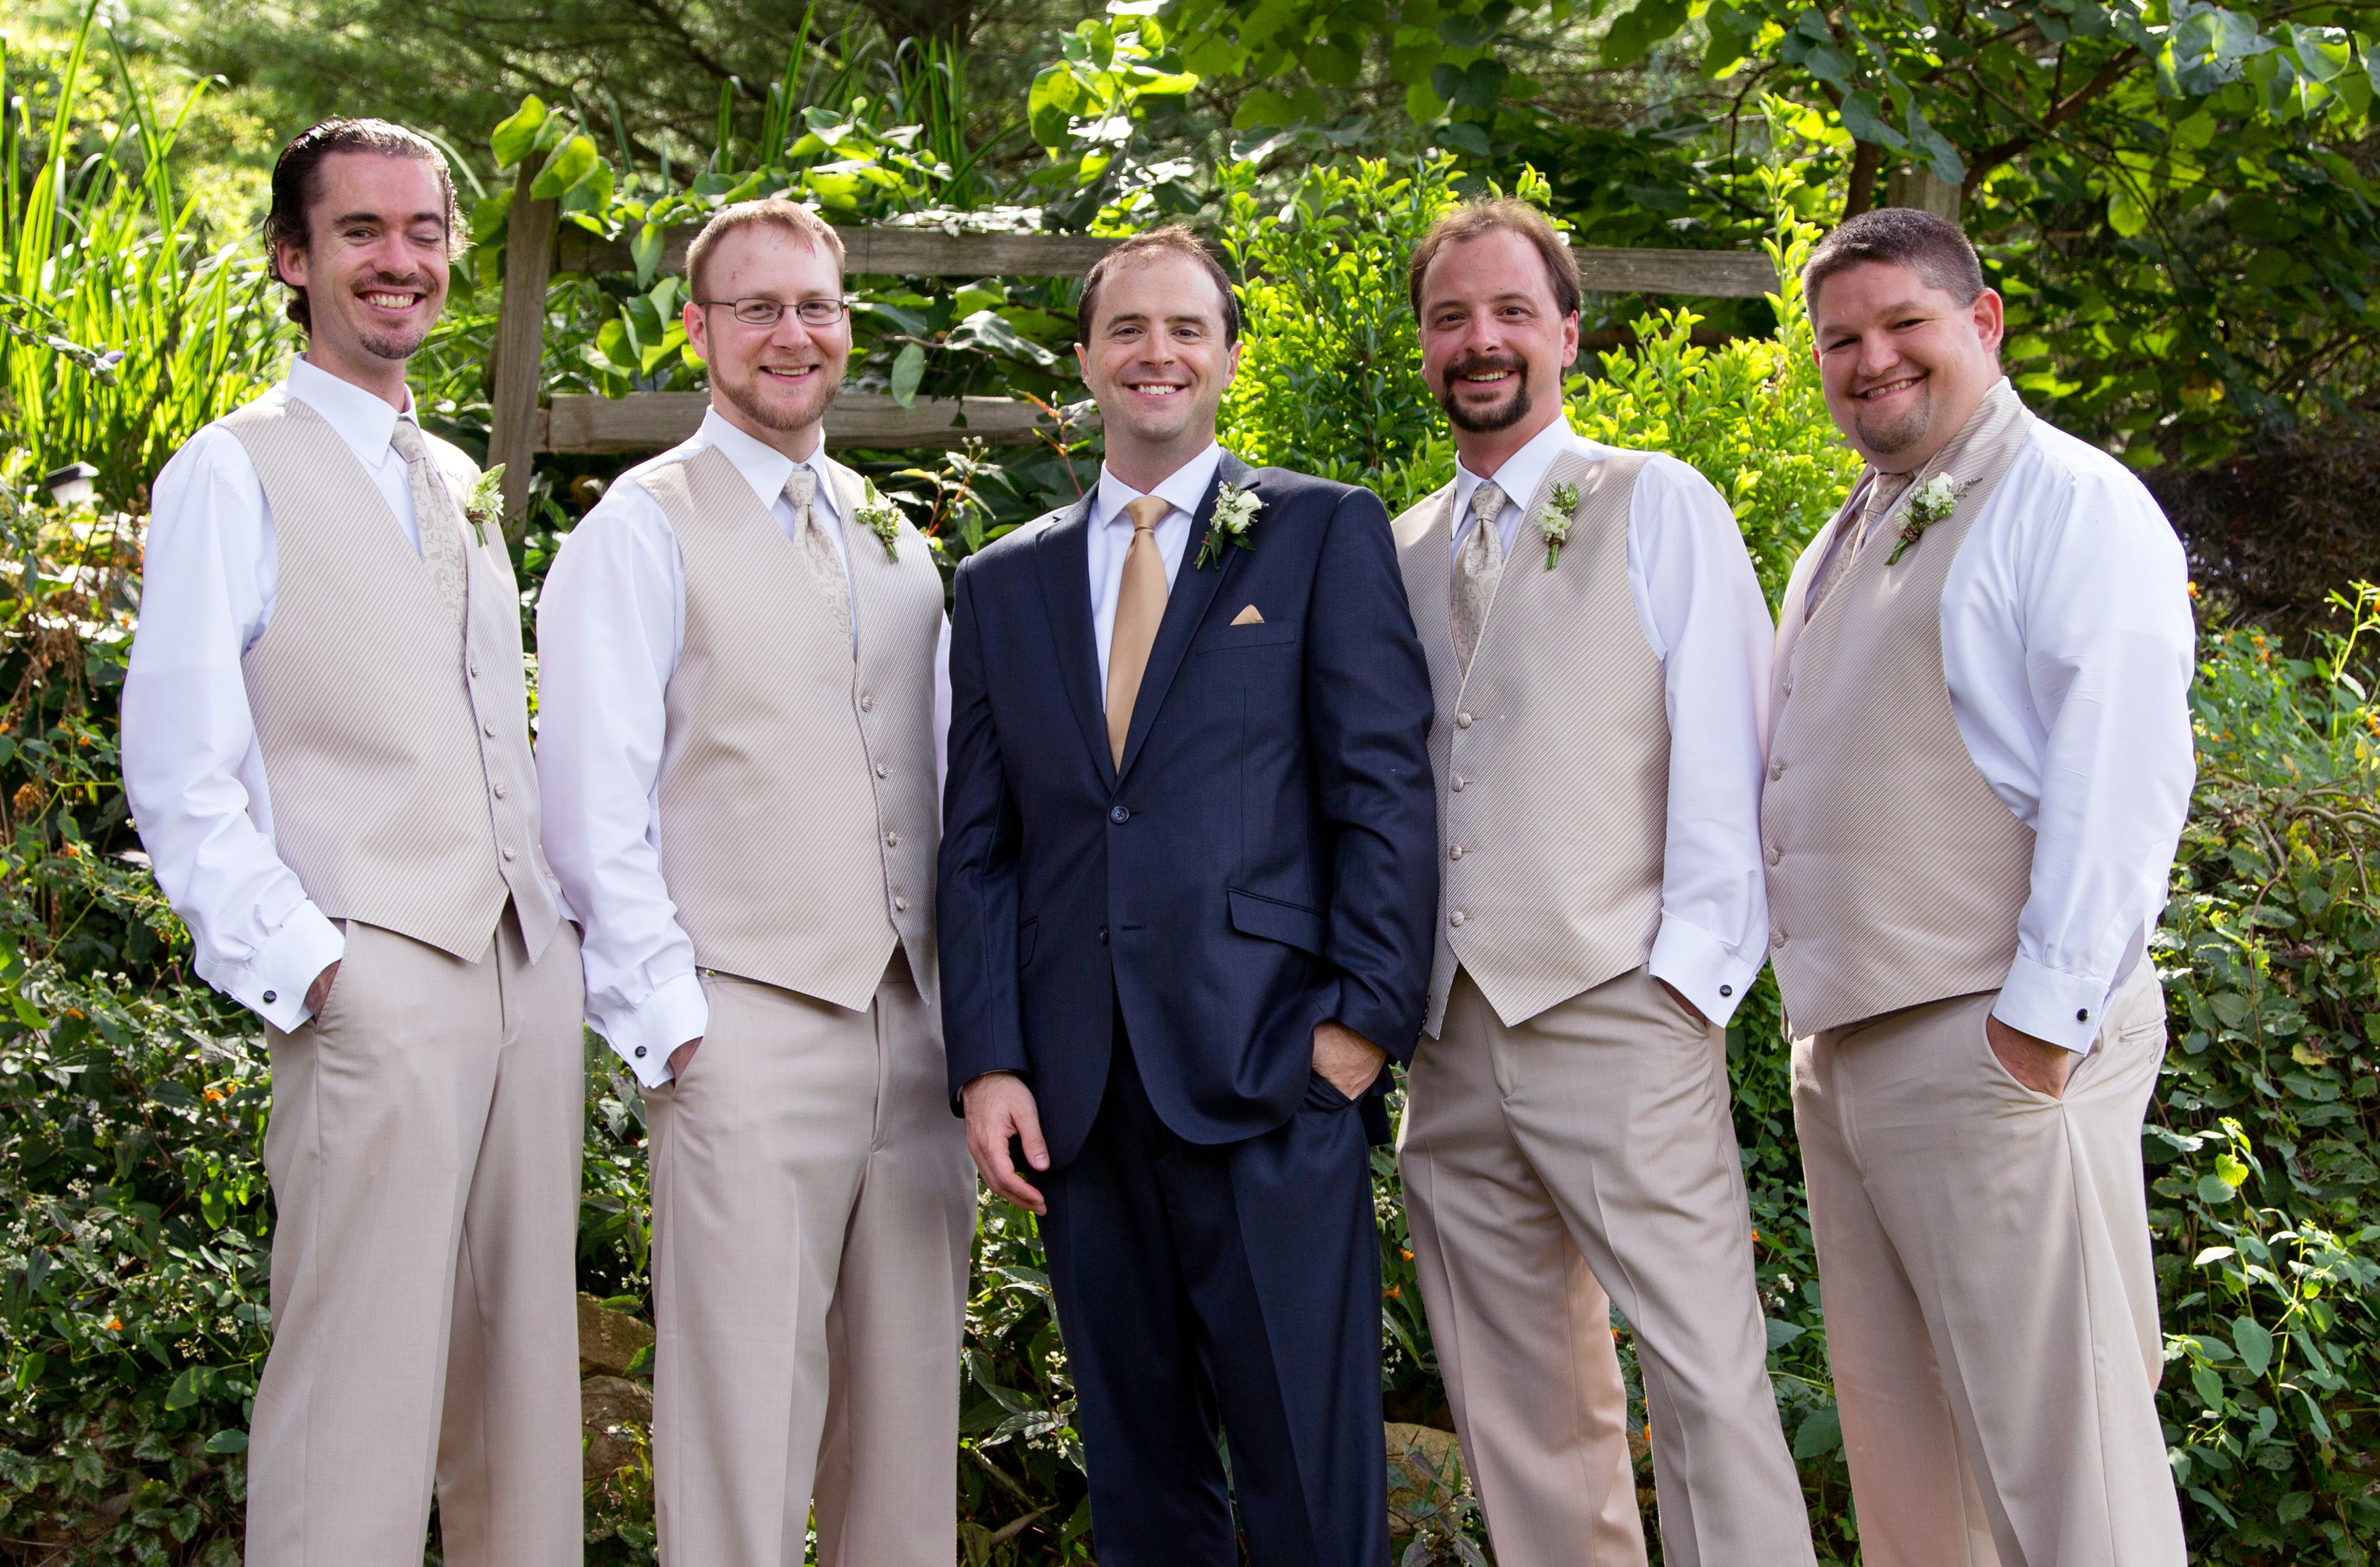 Groomsmen - Groom in navy suit with champagne tie, groomsmen in ...